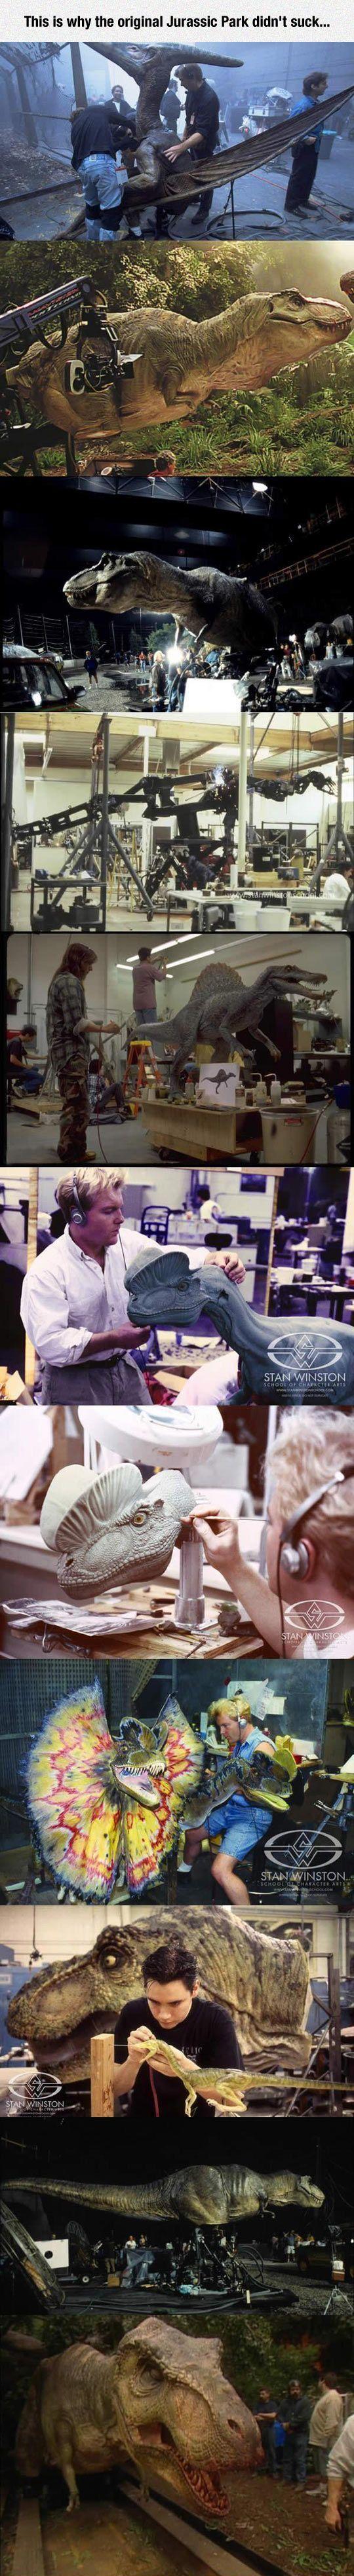 Why the original Jurassic Park didn't suck. #dinosaurpics